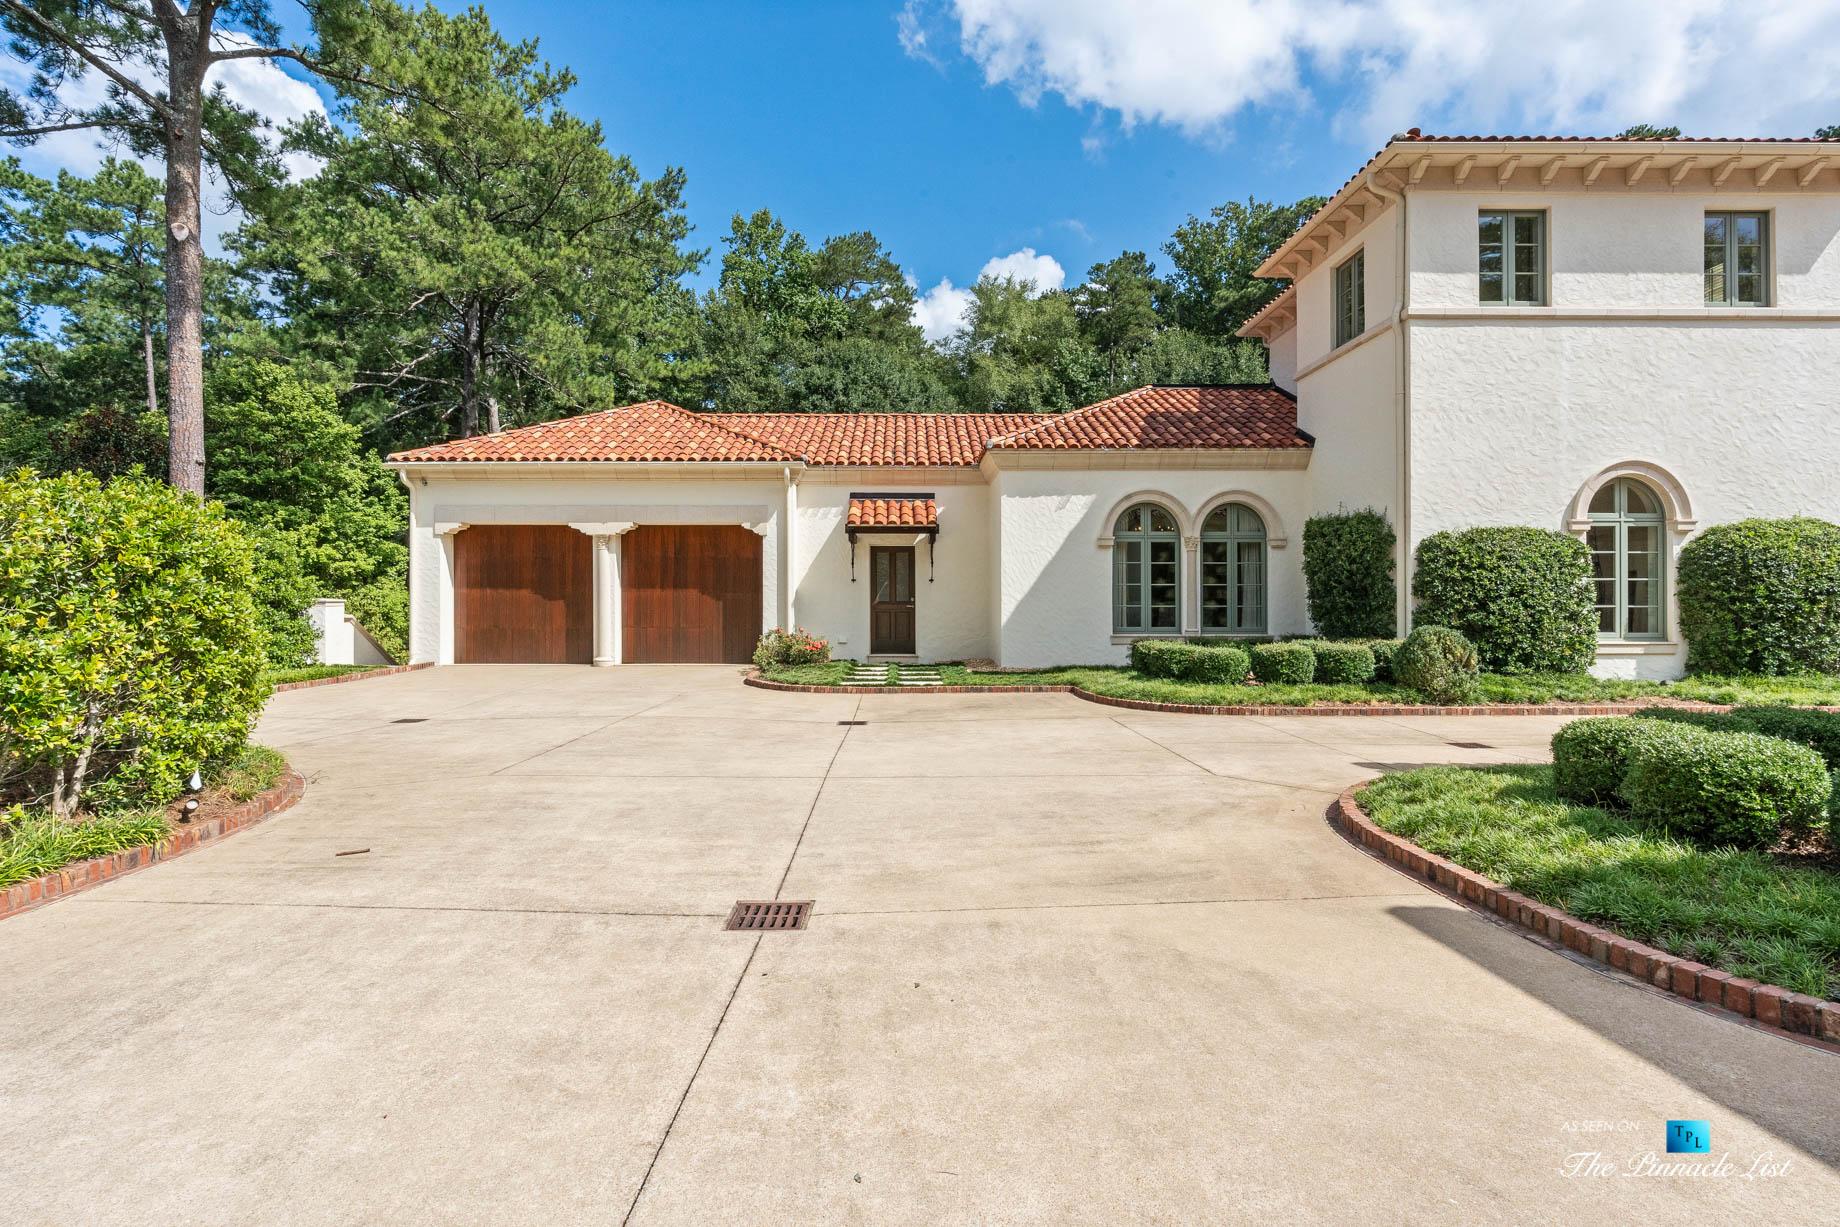 439 Blackland Rd NW, Atlanta, GA, USA - Driveway and Garage - Luxury Real Estate - Tuxedo Park Mediterranean Mansion Home